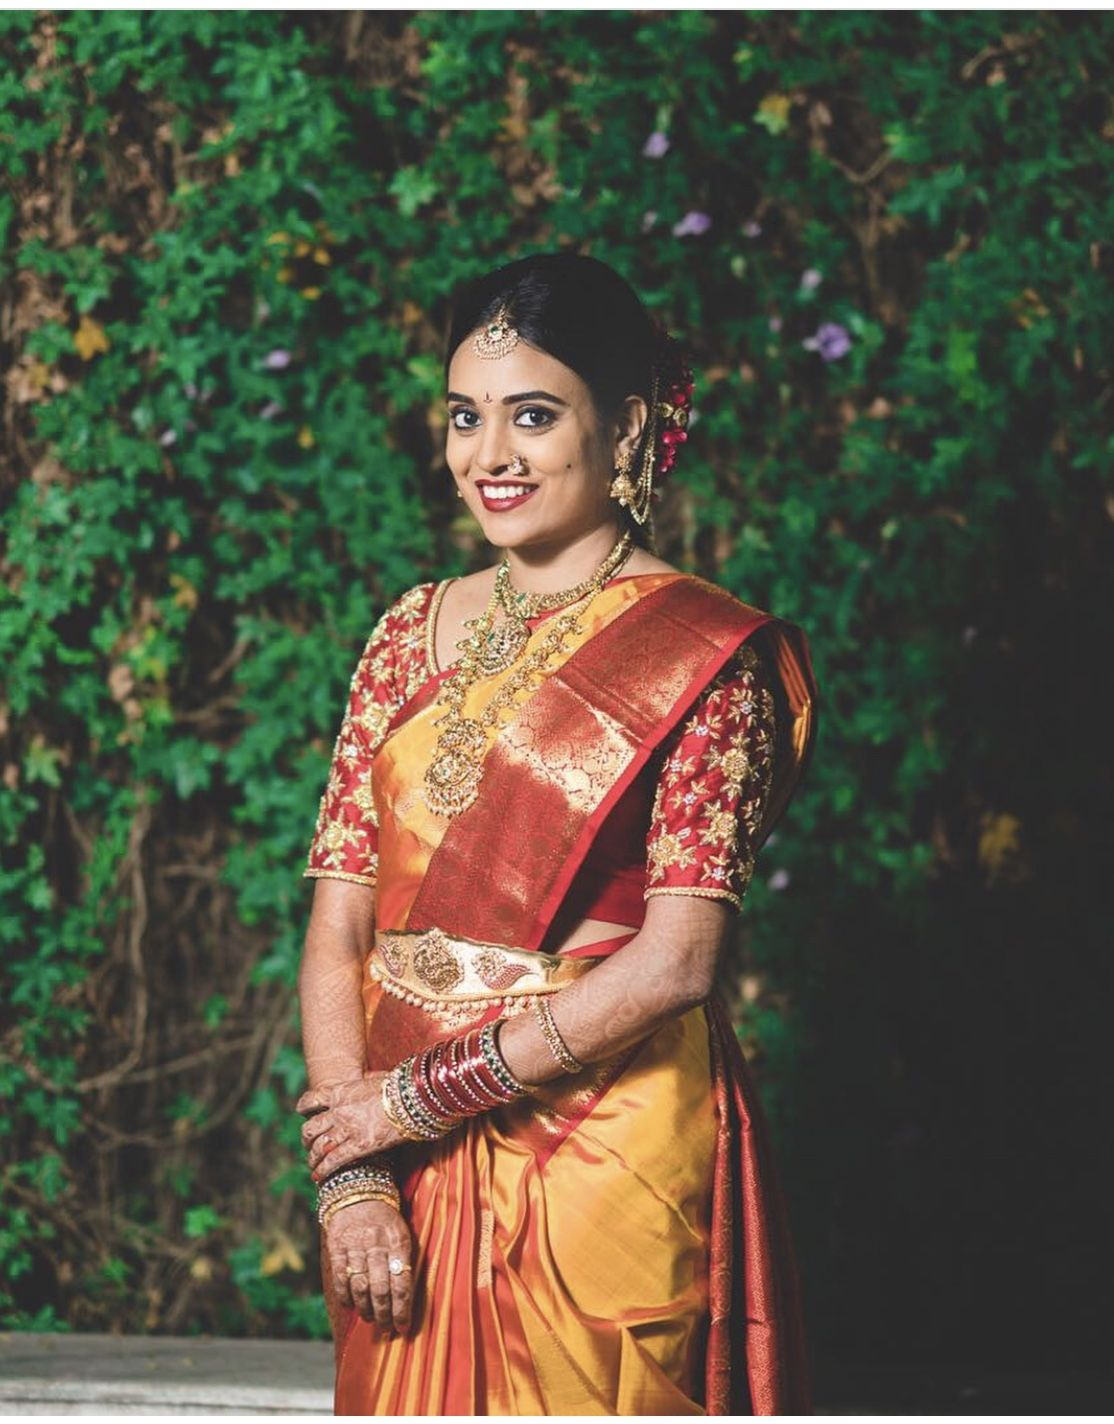 Royal South Indian bride | Brides | Pinterest